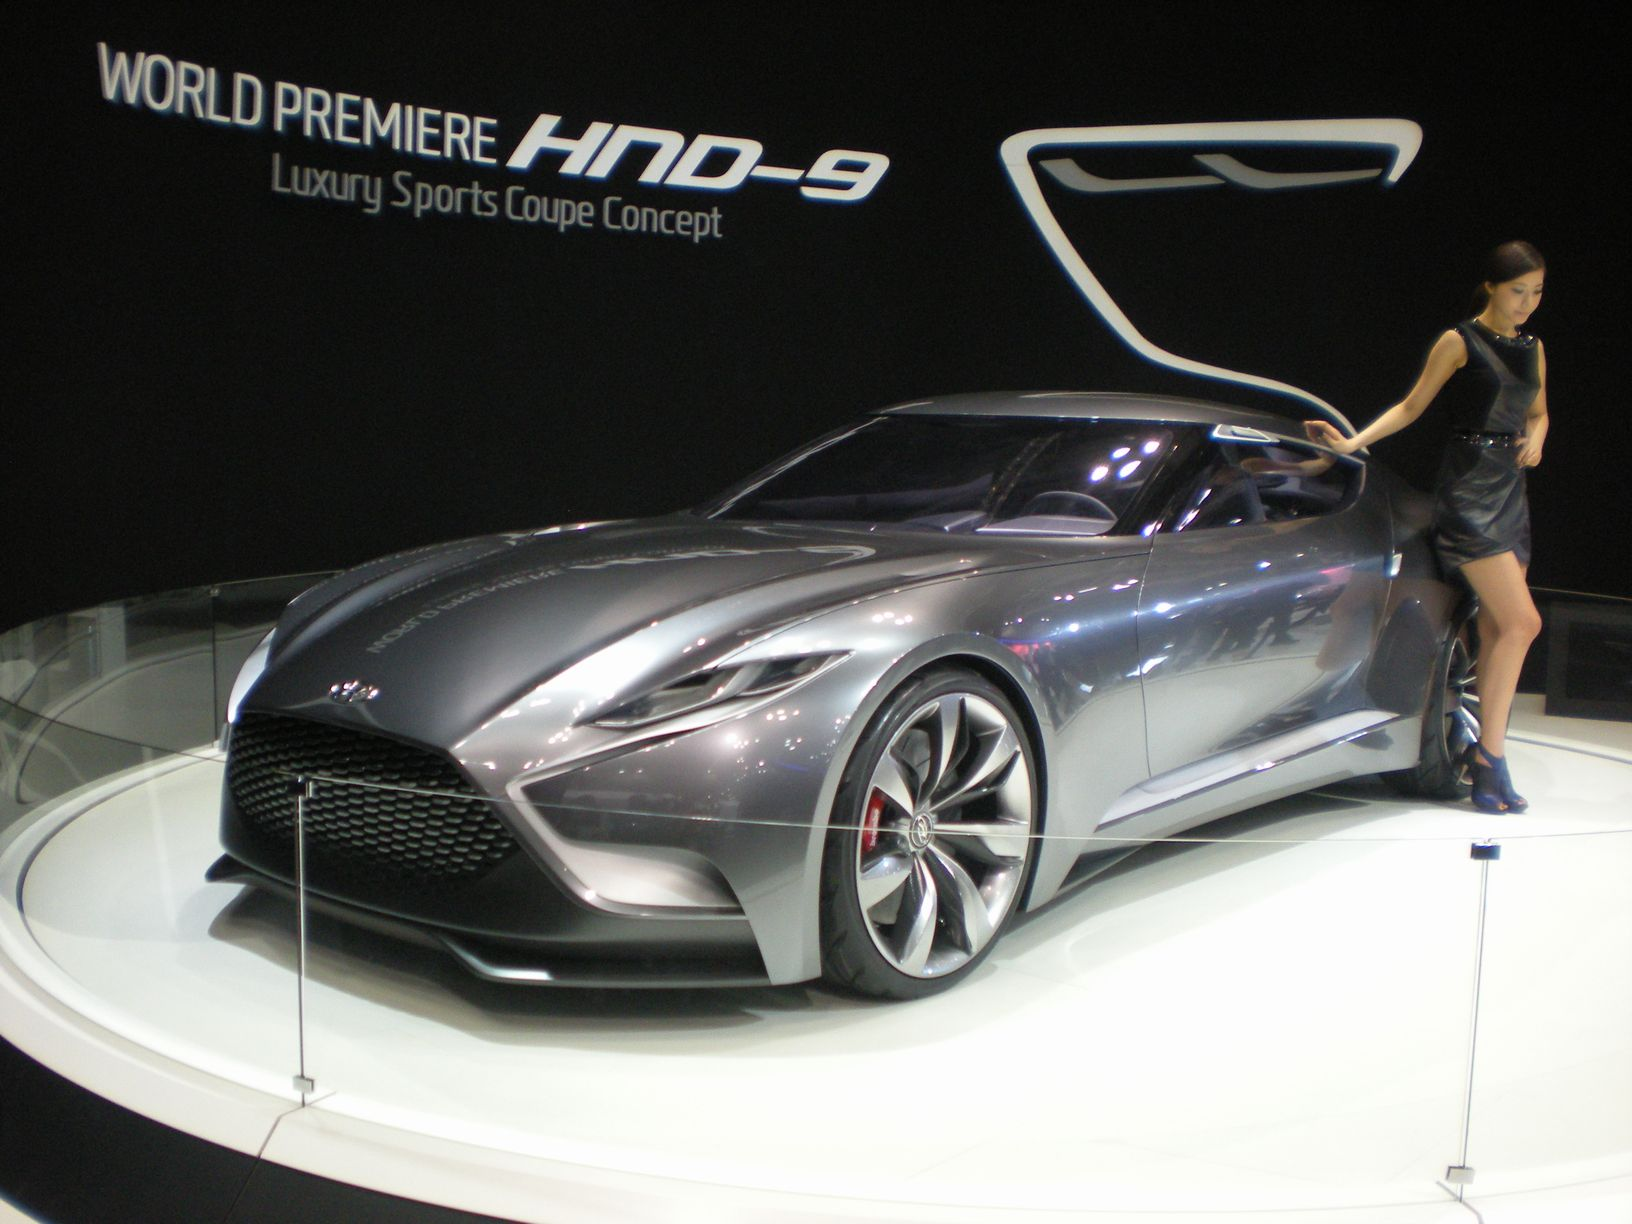 Genesis Coupe 2018 >> File:HYUNDAI HND-9 01.JPG - Wikimedia Commons